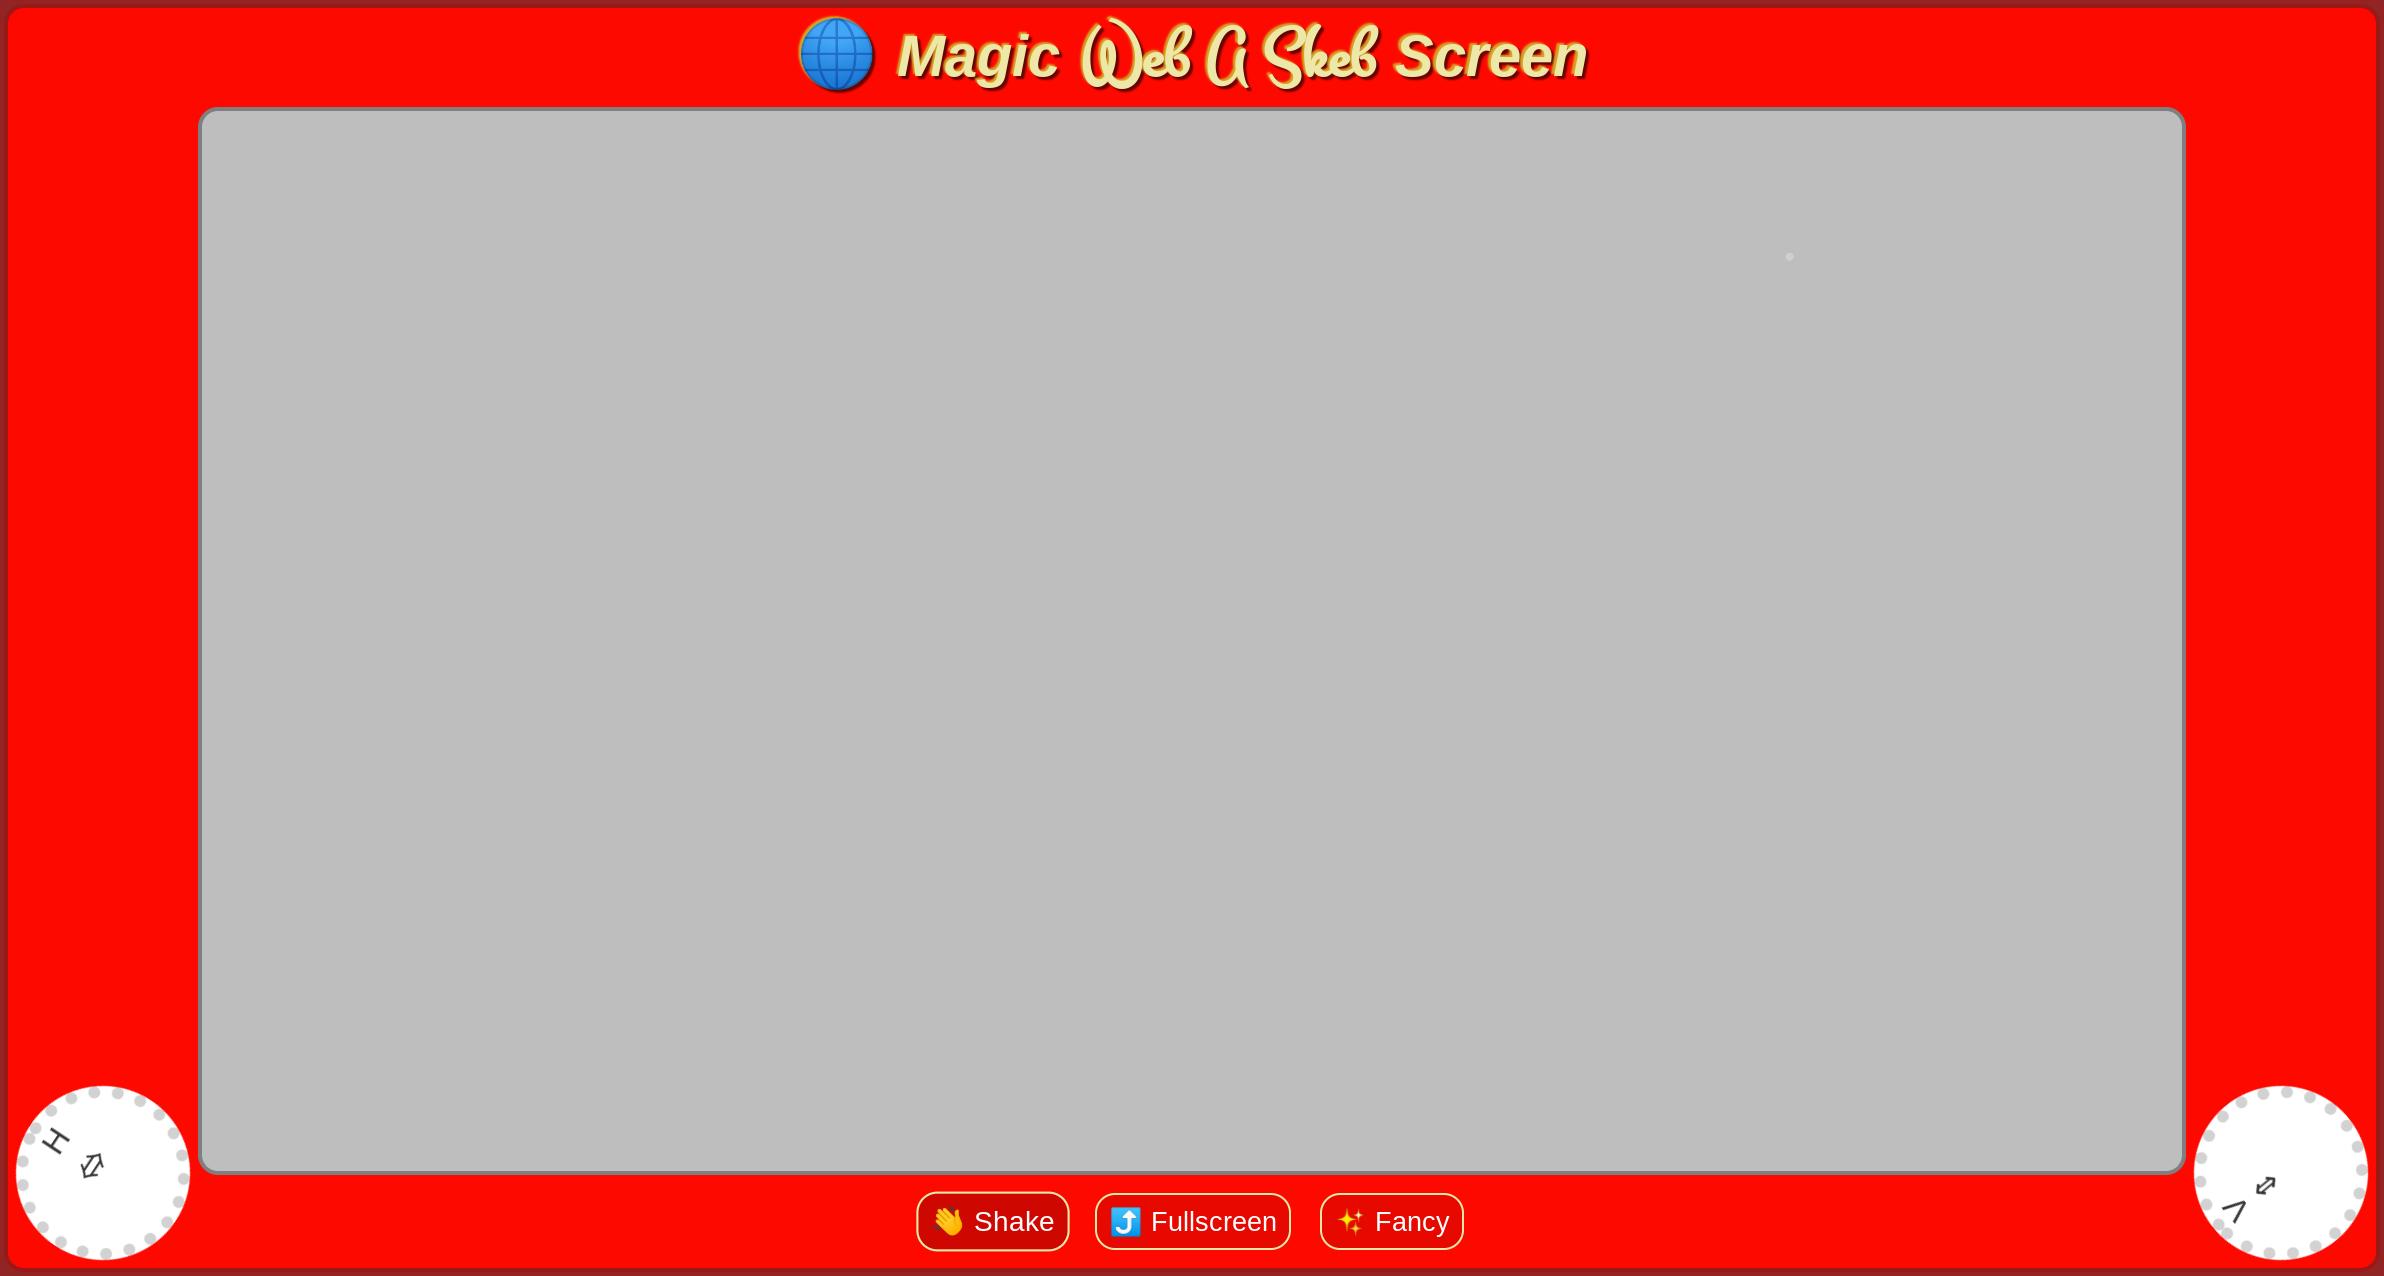 Screenshot 2019-01-09 at 4.45.06 PM.png